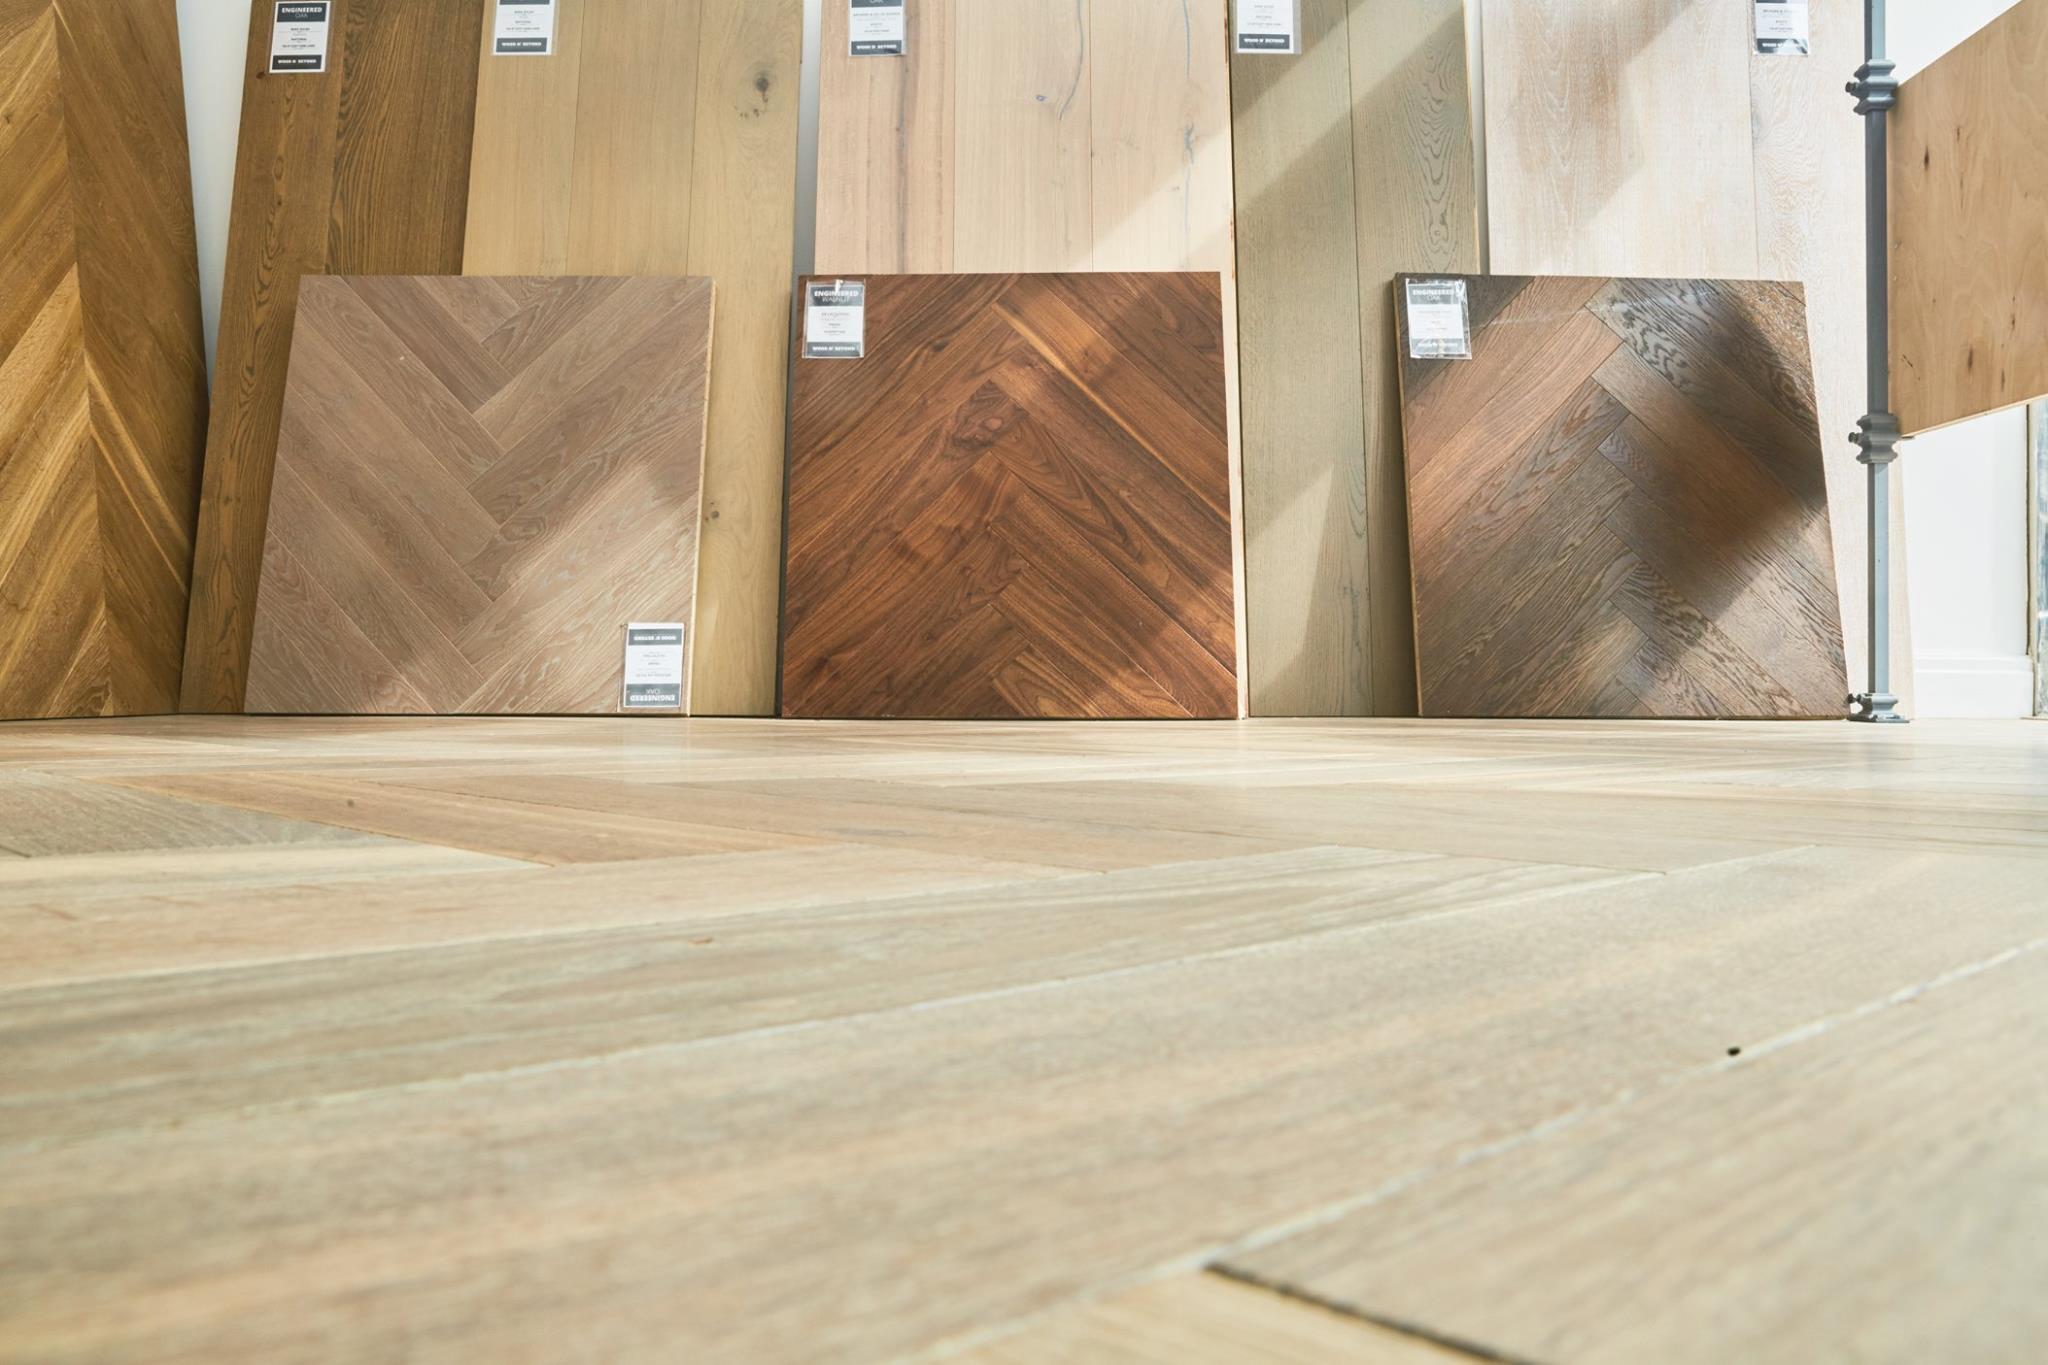 Oak Herringbone Flooring Natural Light Dark Wood and Beyond Blog